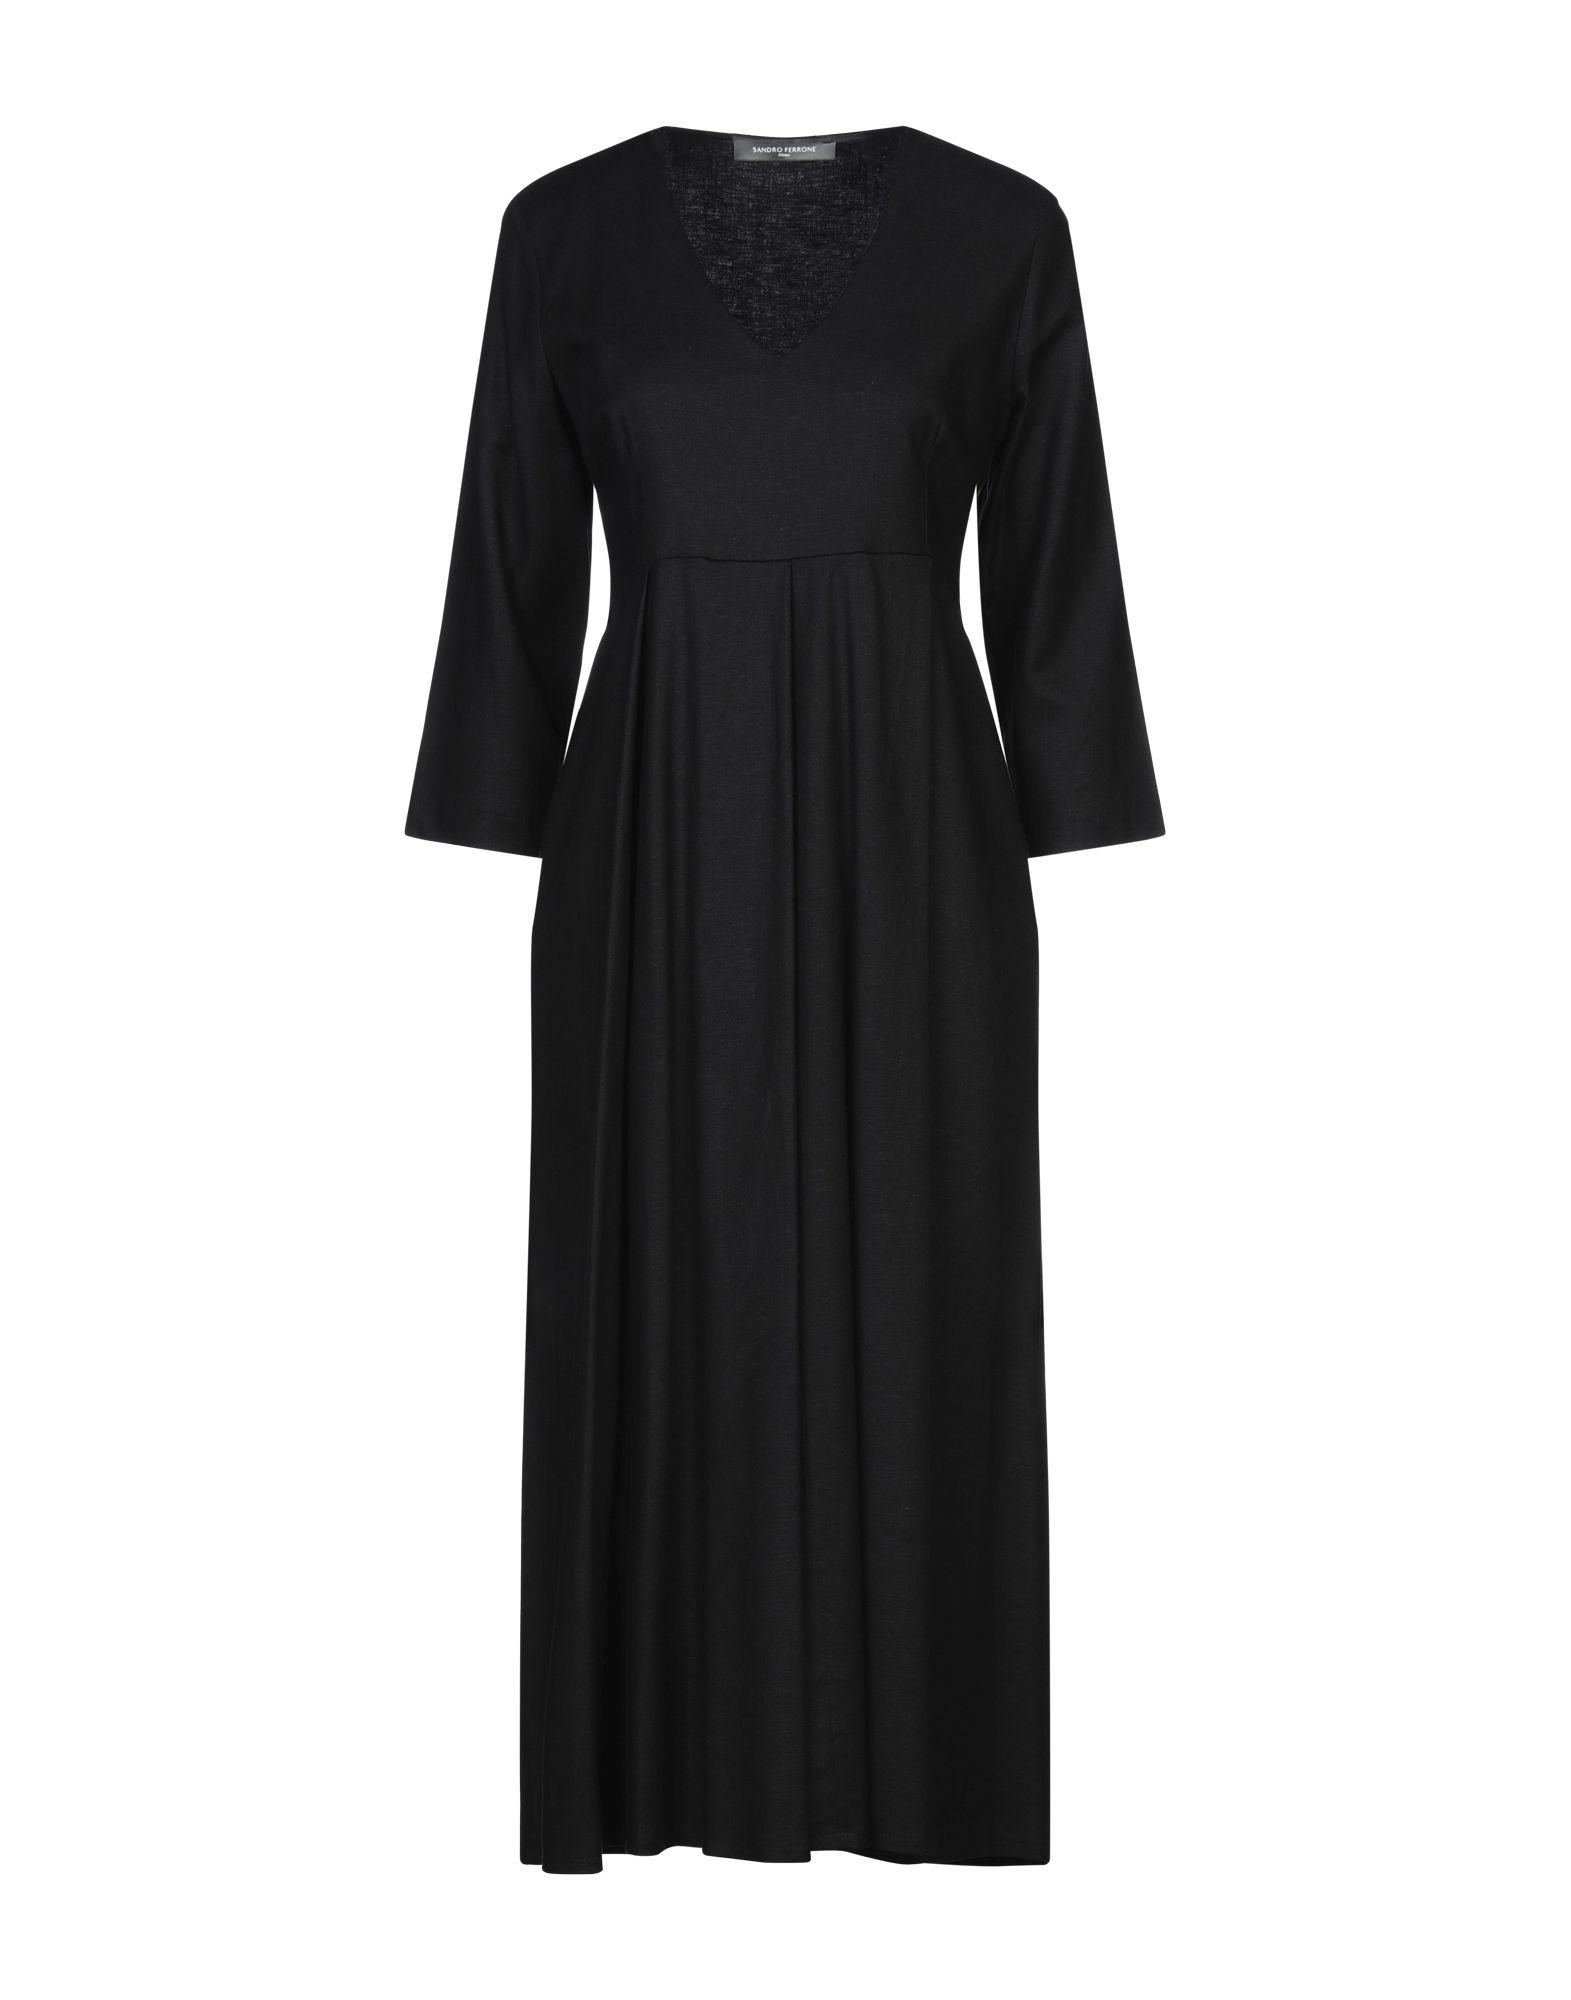 SANDRO FERRONE Платье длиной 3/4